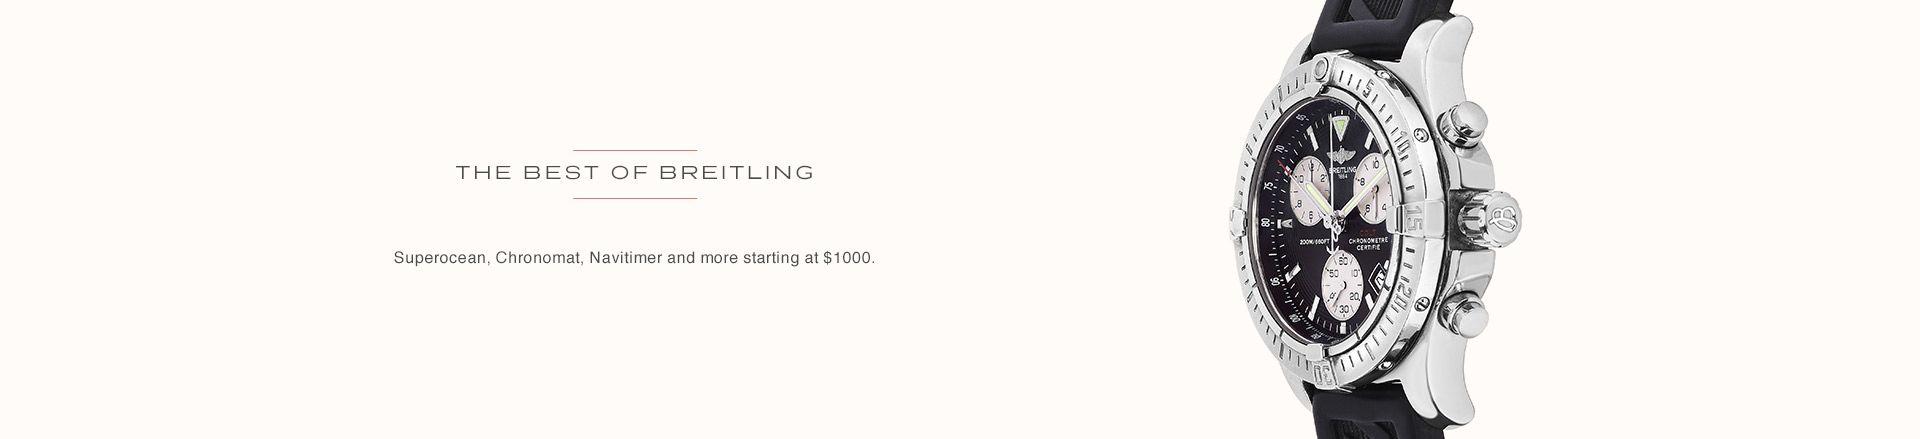 Best of Breitling